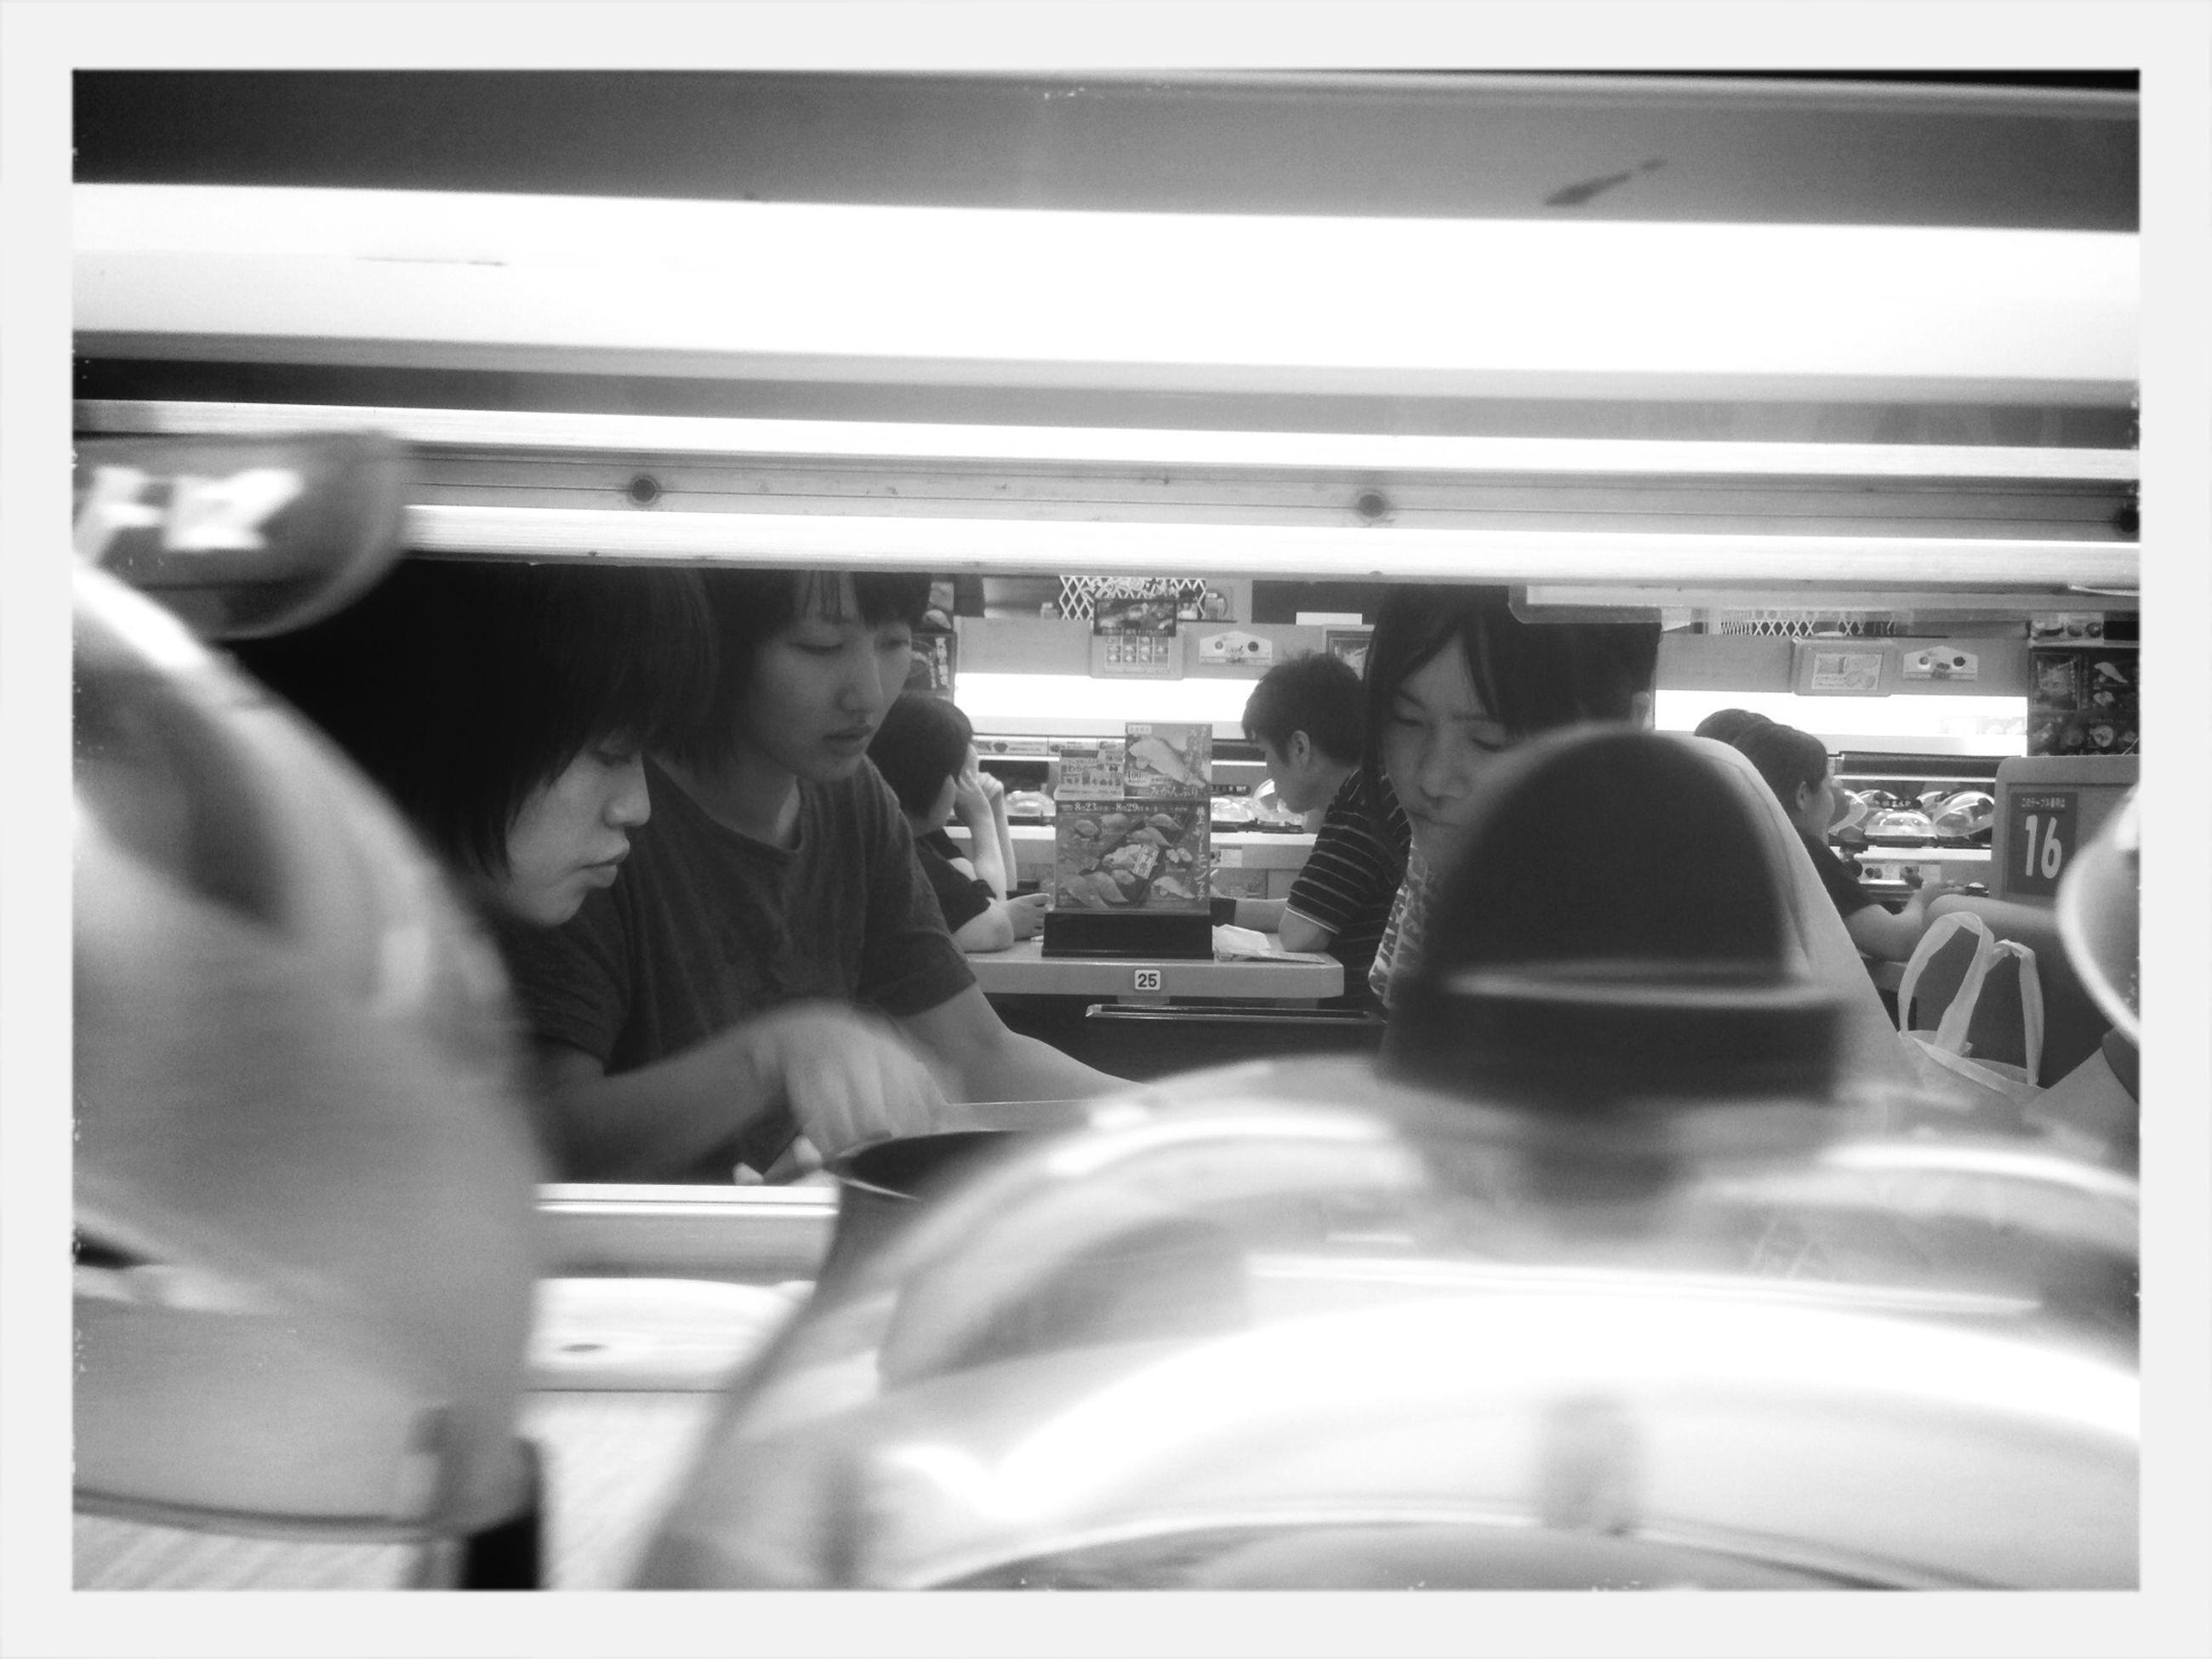 indoors, lifestyles, vehicle interior, men, transportation, leisure activity, transfer print, person, sitting, mode of transport, public transportation, travel, passenger, land vehicle, window, vehicle seat, bus